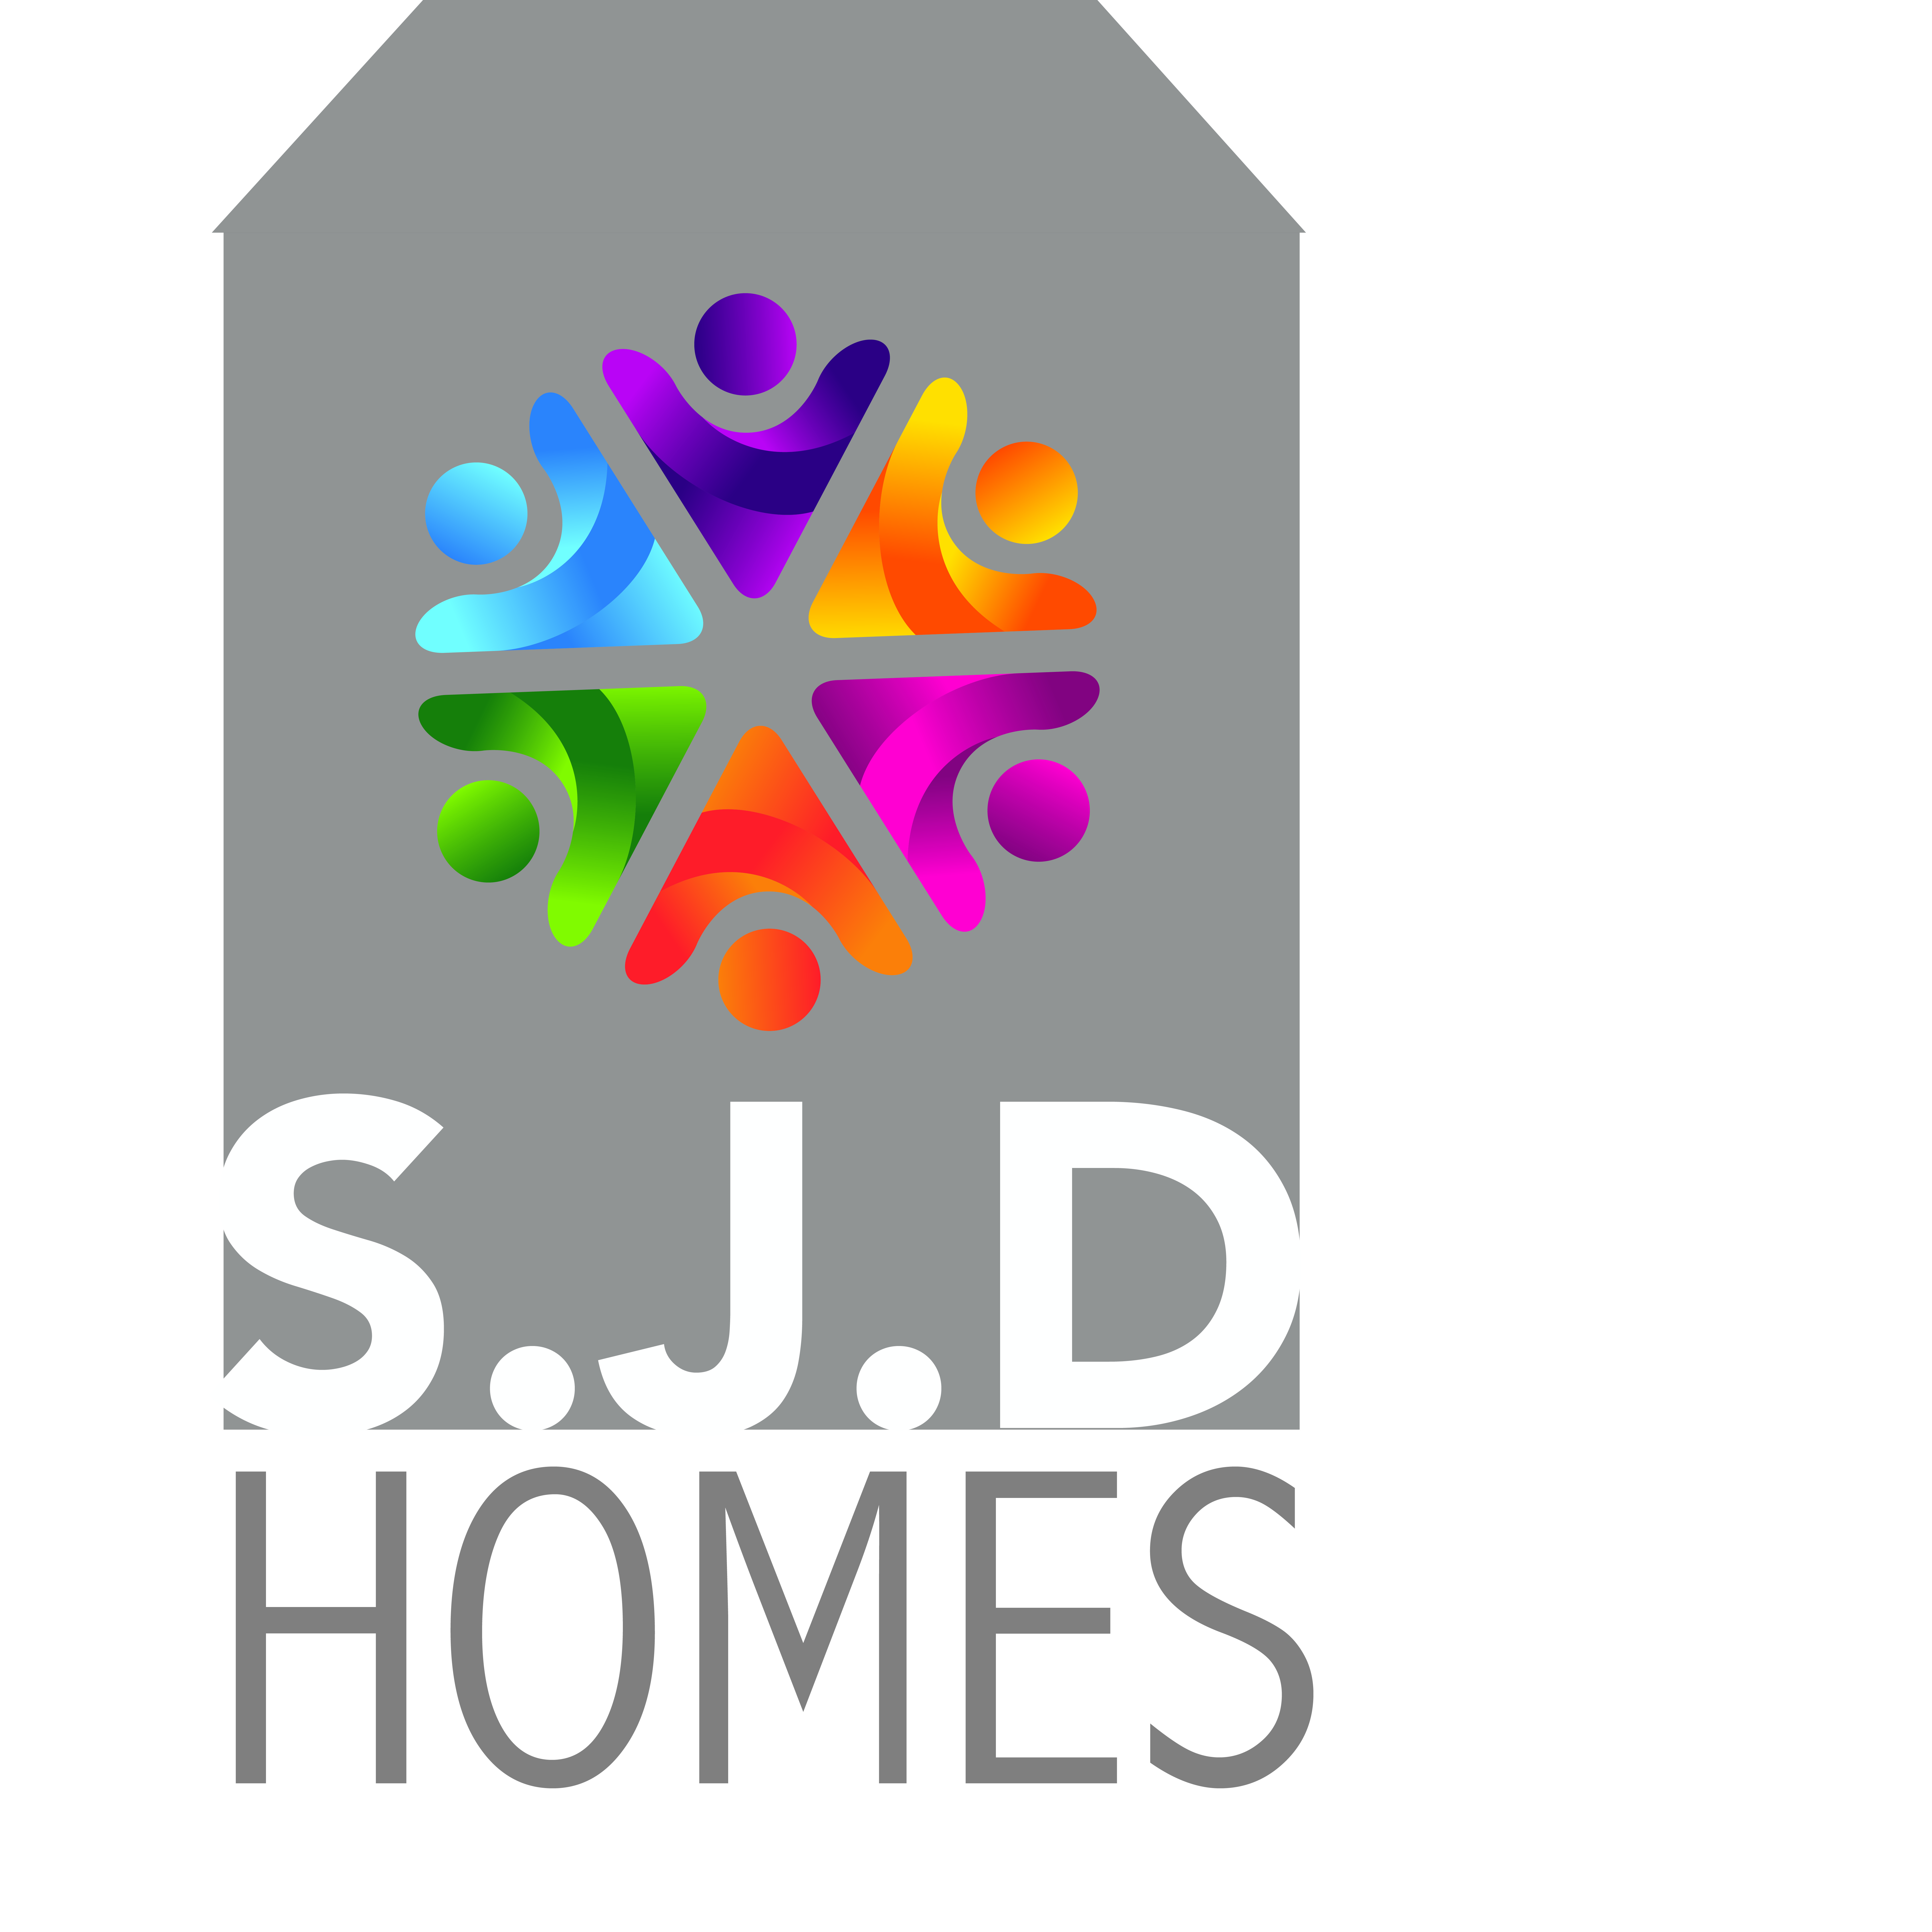 SJD Homes internships in Greater London, London